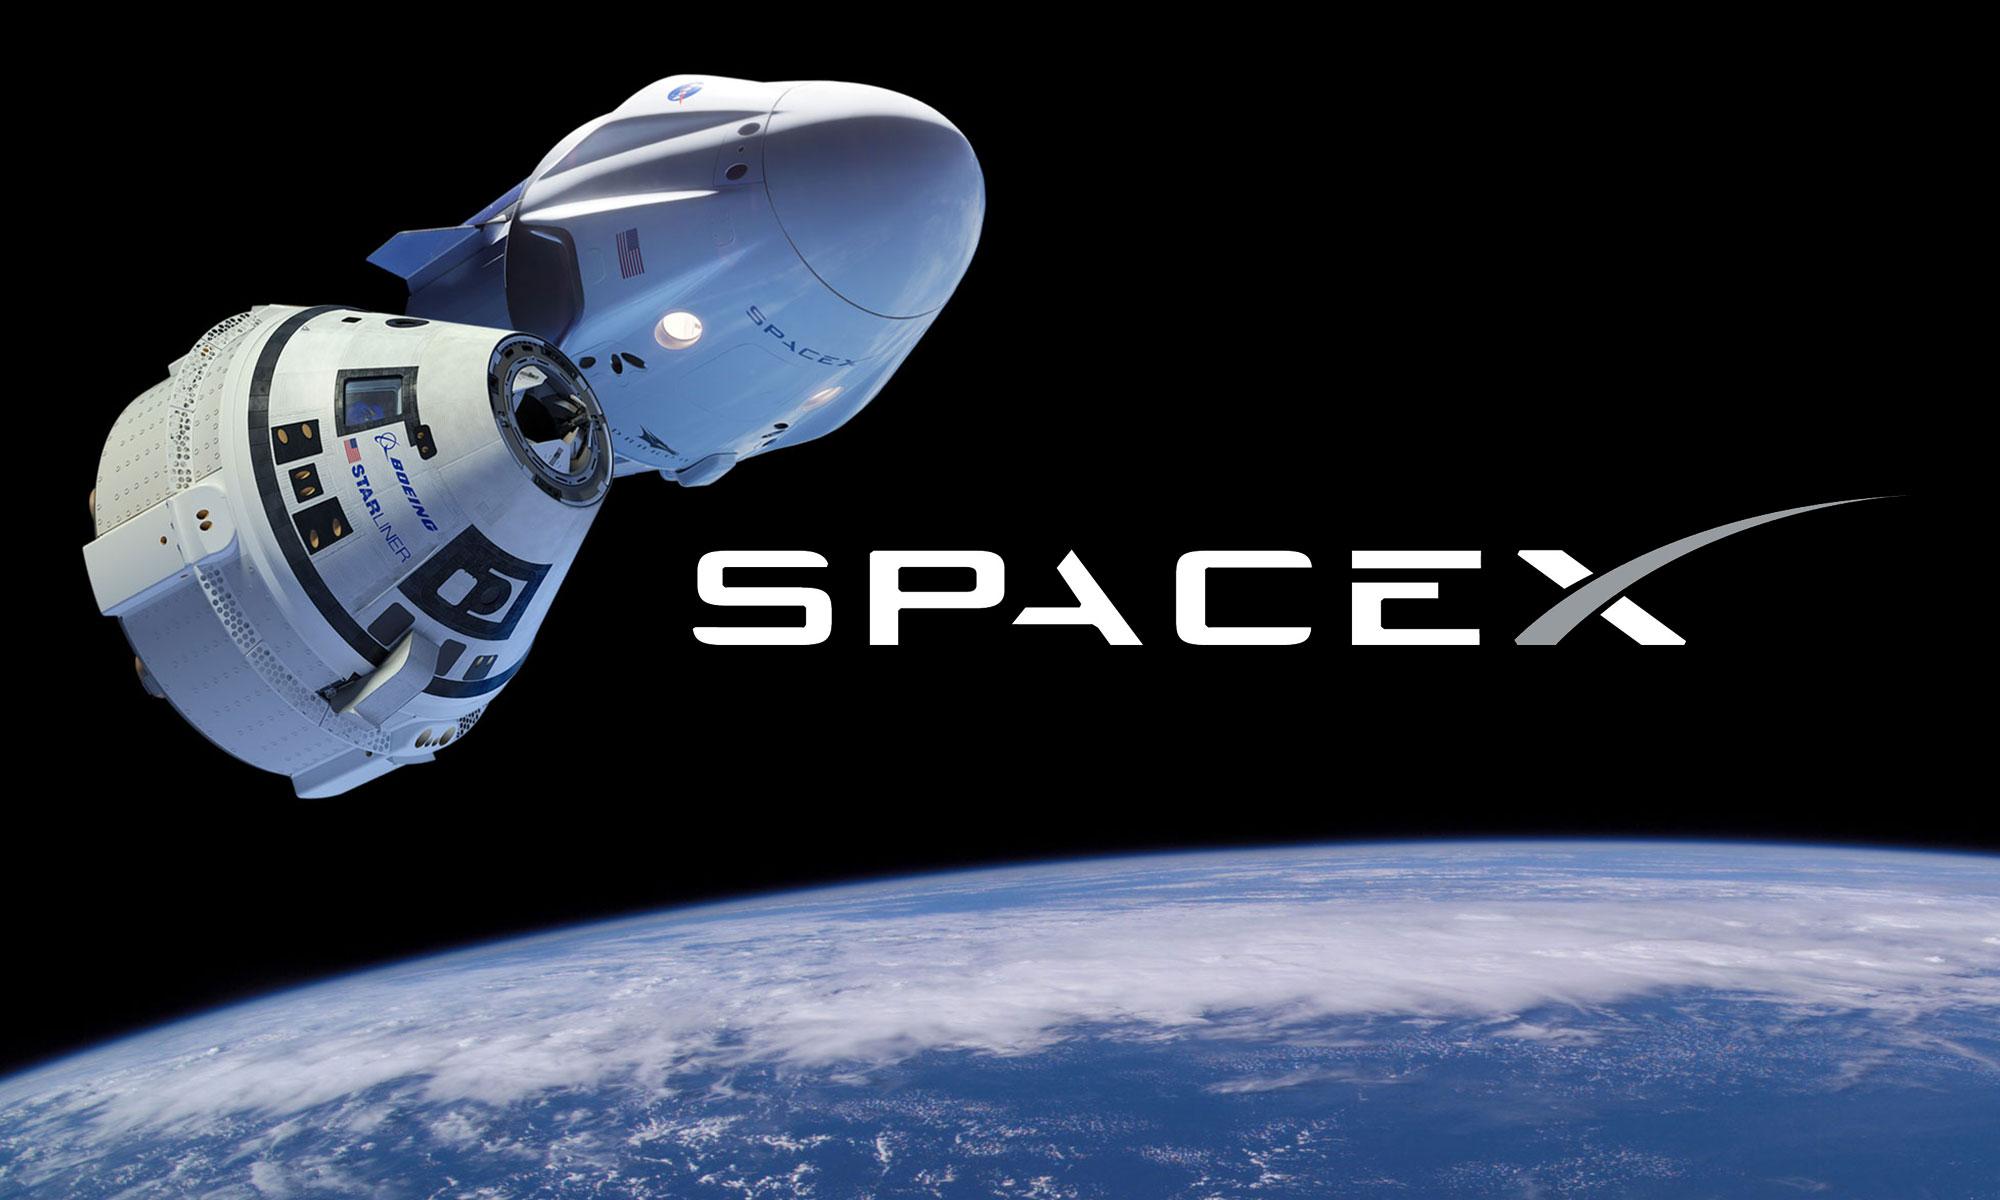 SpaceX поставила 100 000 терминалов для приема Интернета из космоса